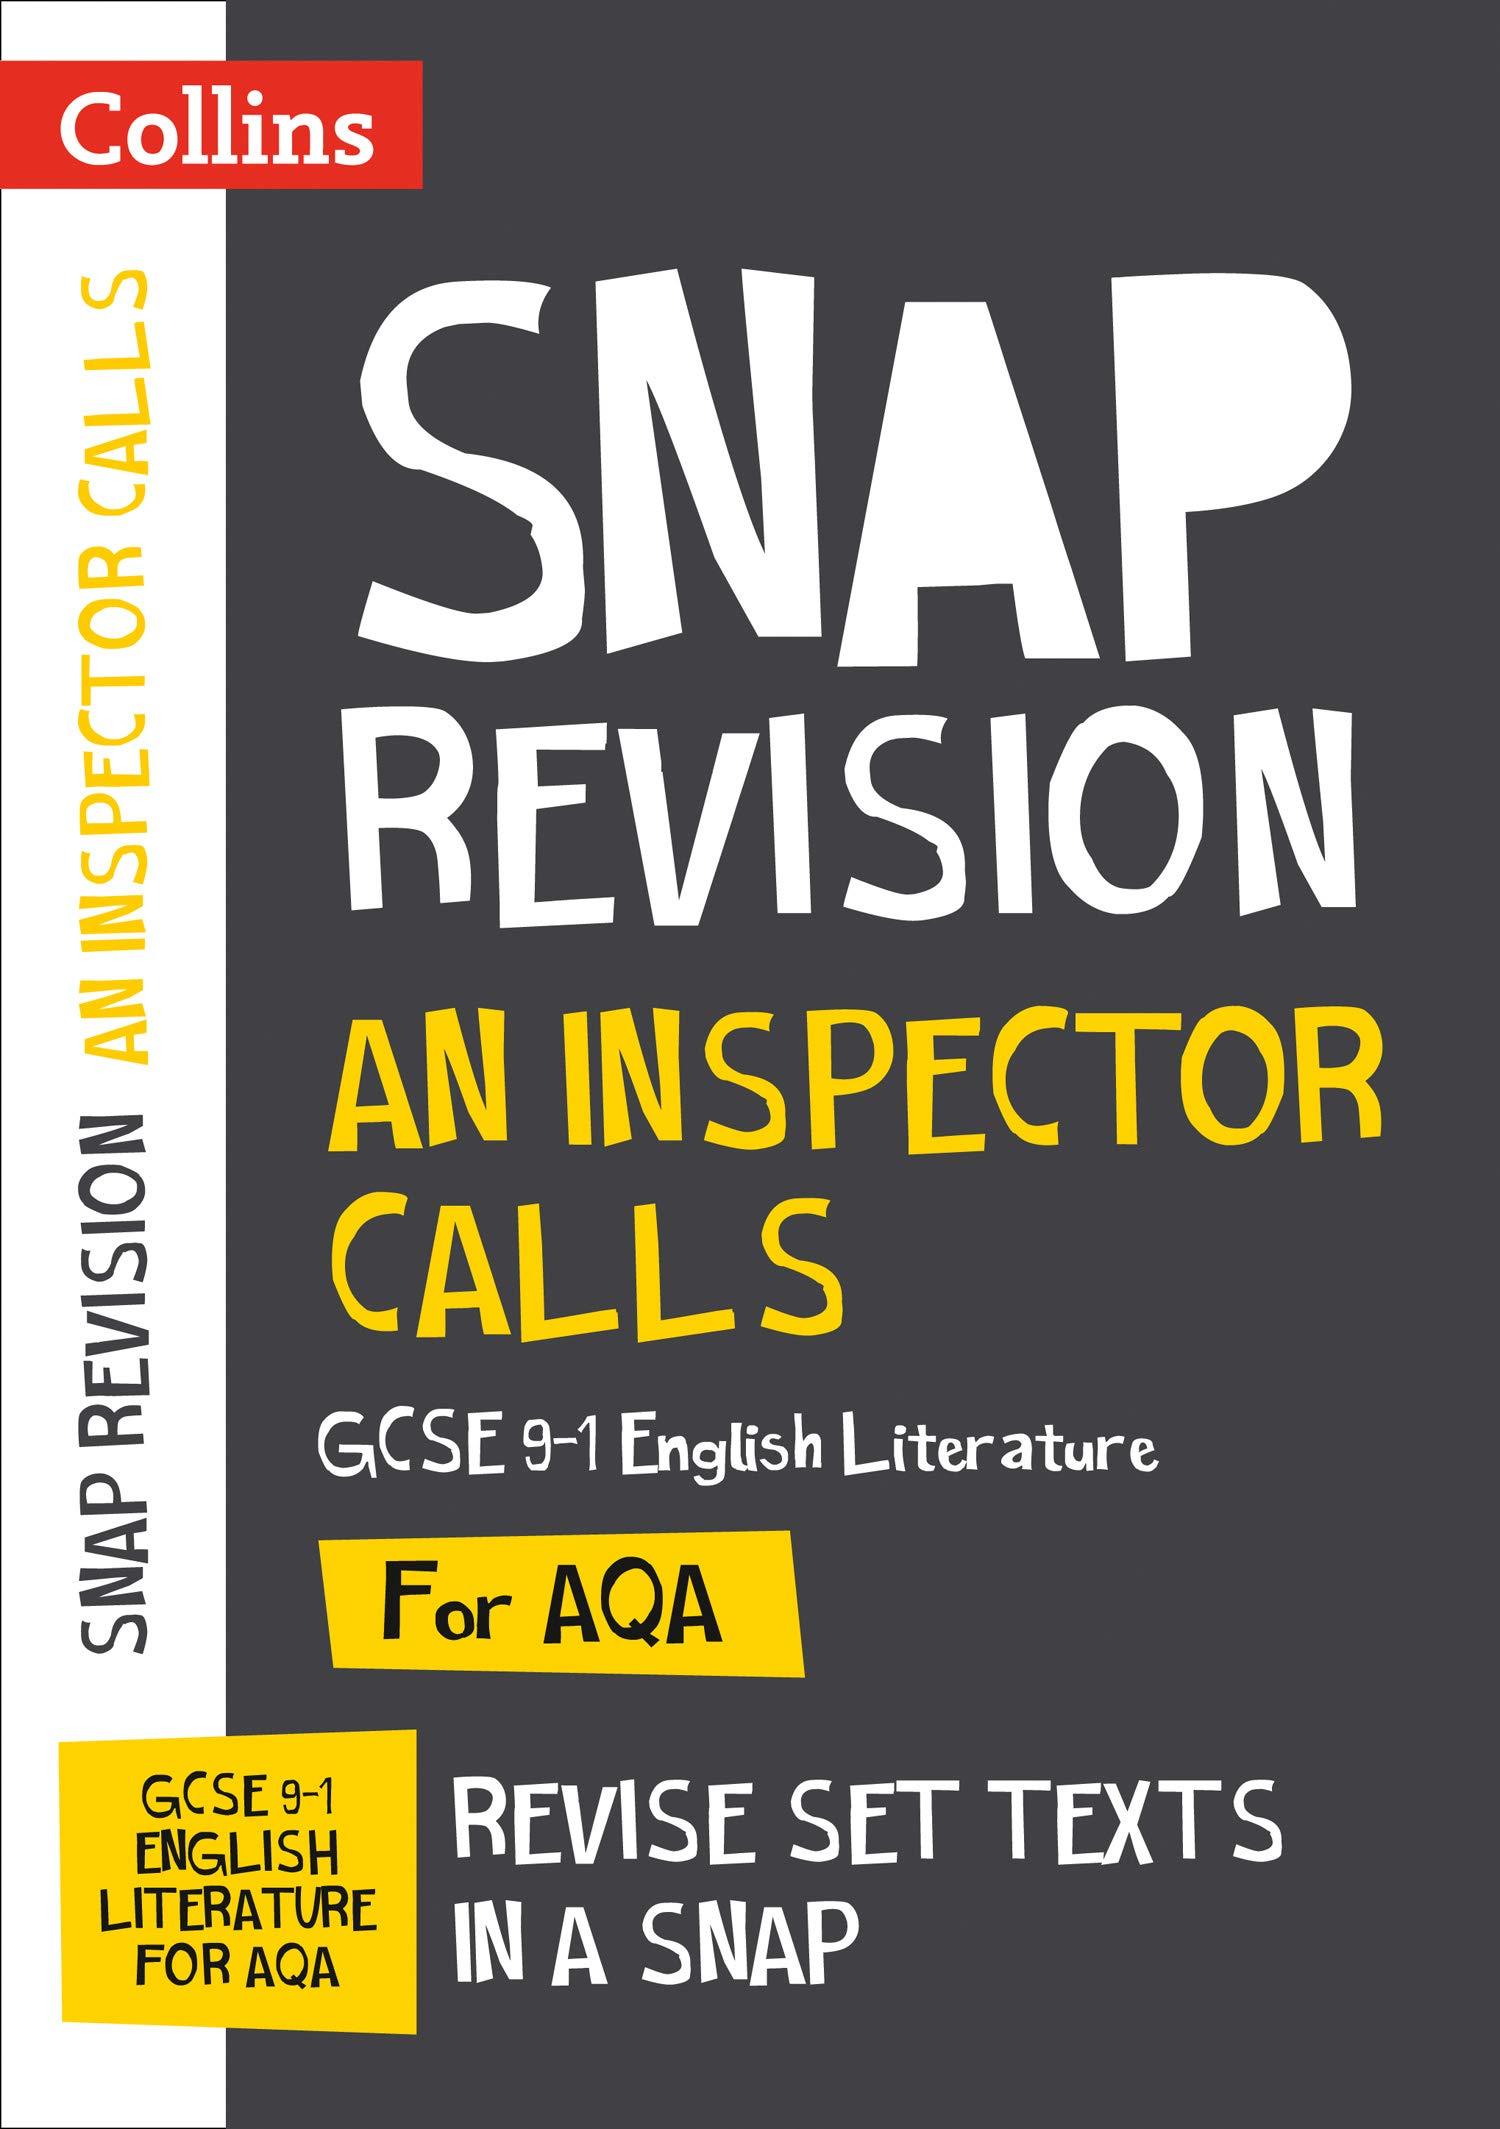 An Inspector Calls: New Grade 9-1 GCSE English Literature AQA Text Guide (Collins GCSE 9-1 Snap Revision)